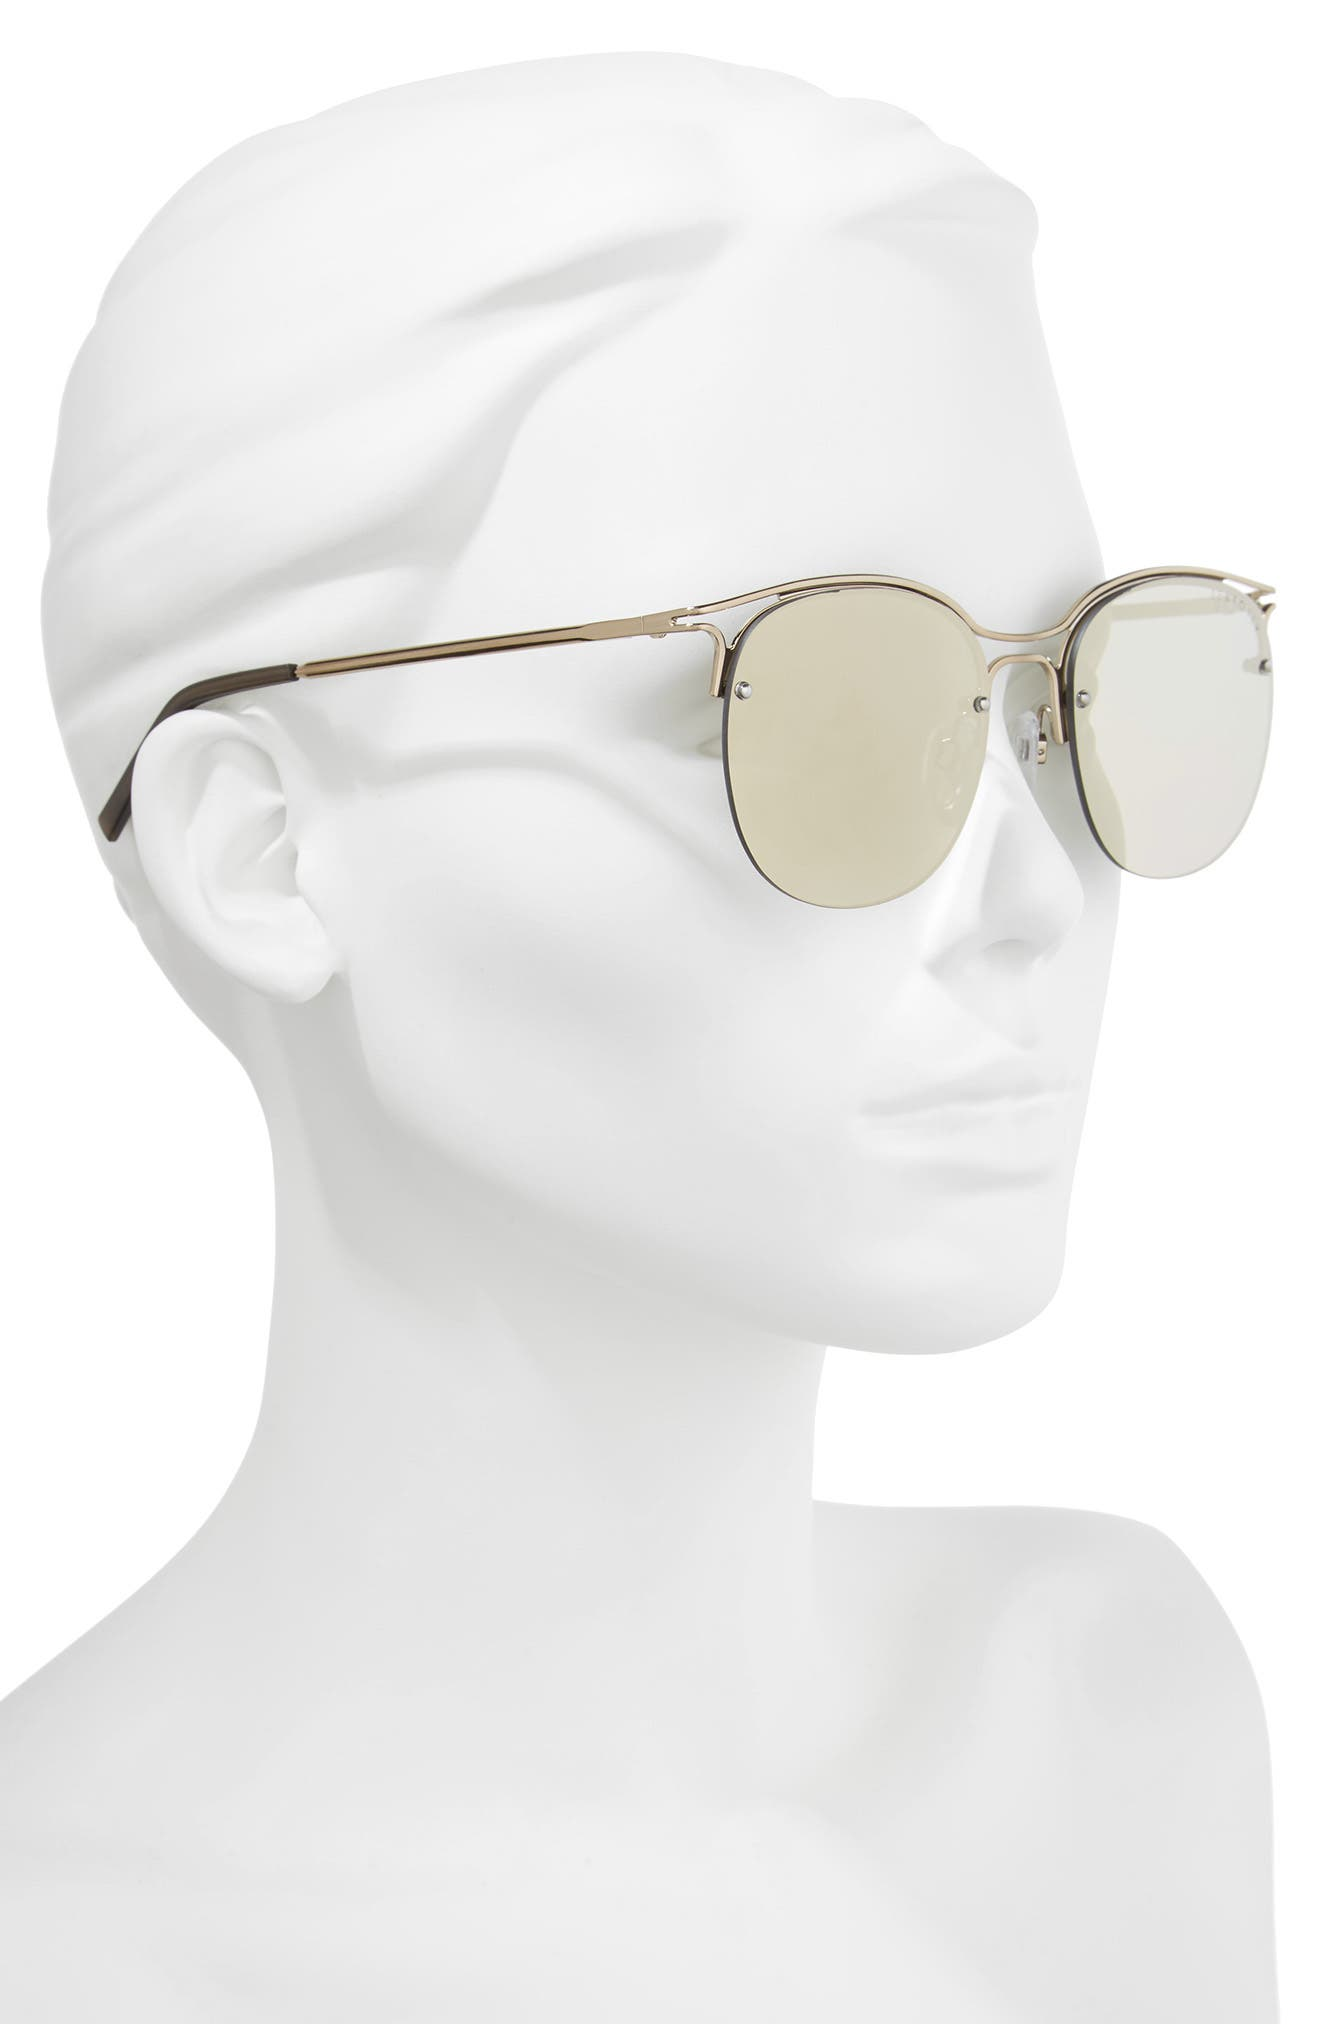 Freshwater 55m Metal Sunglasses,                             Alternate thumbnail 2, color,                             Moss